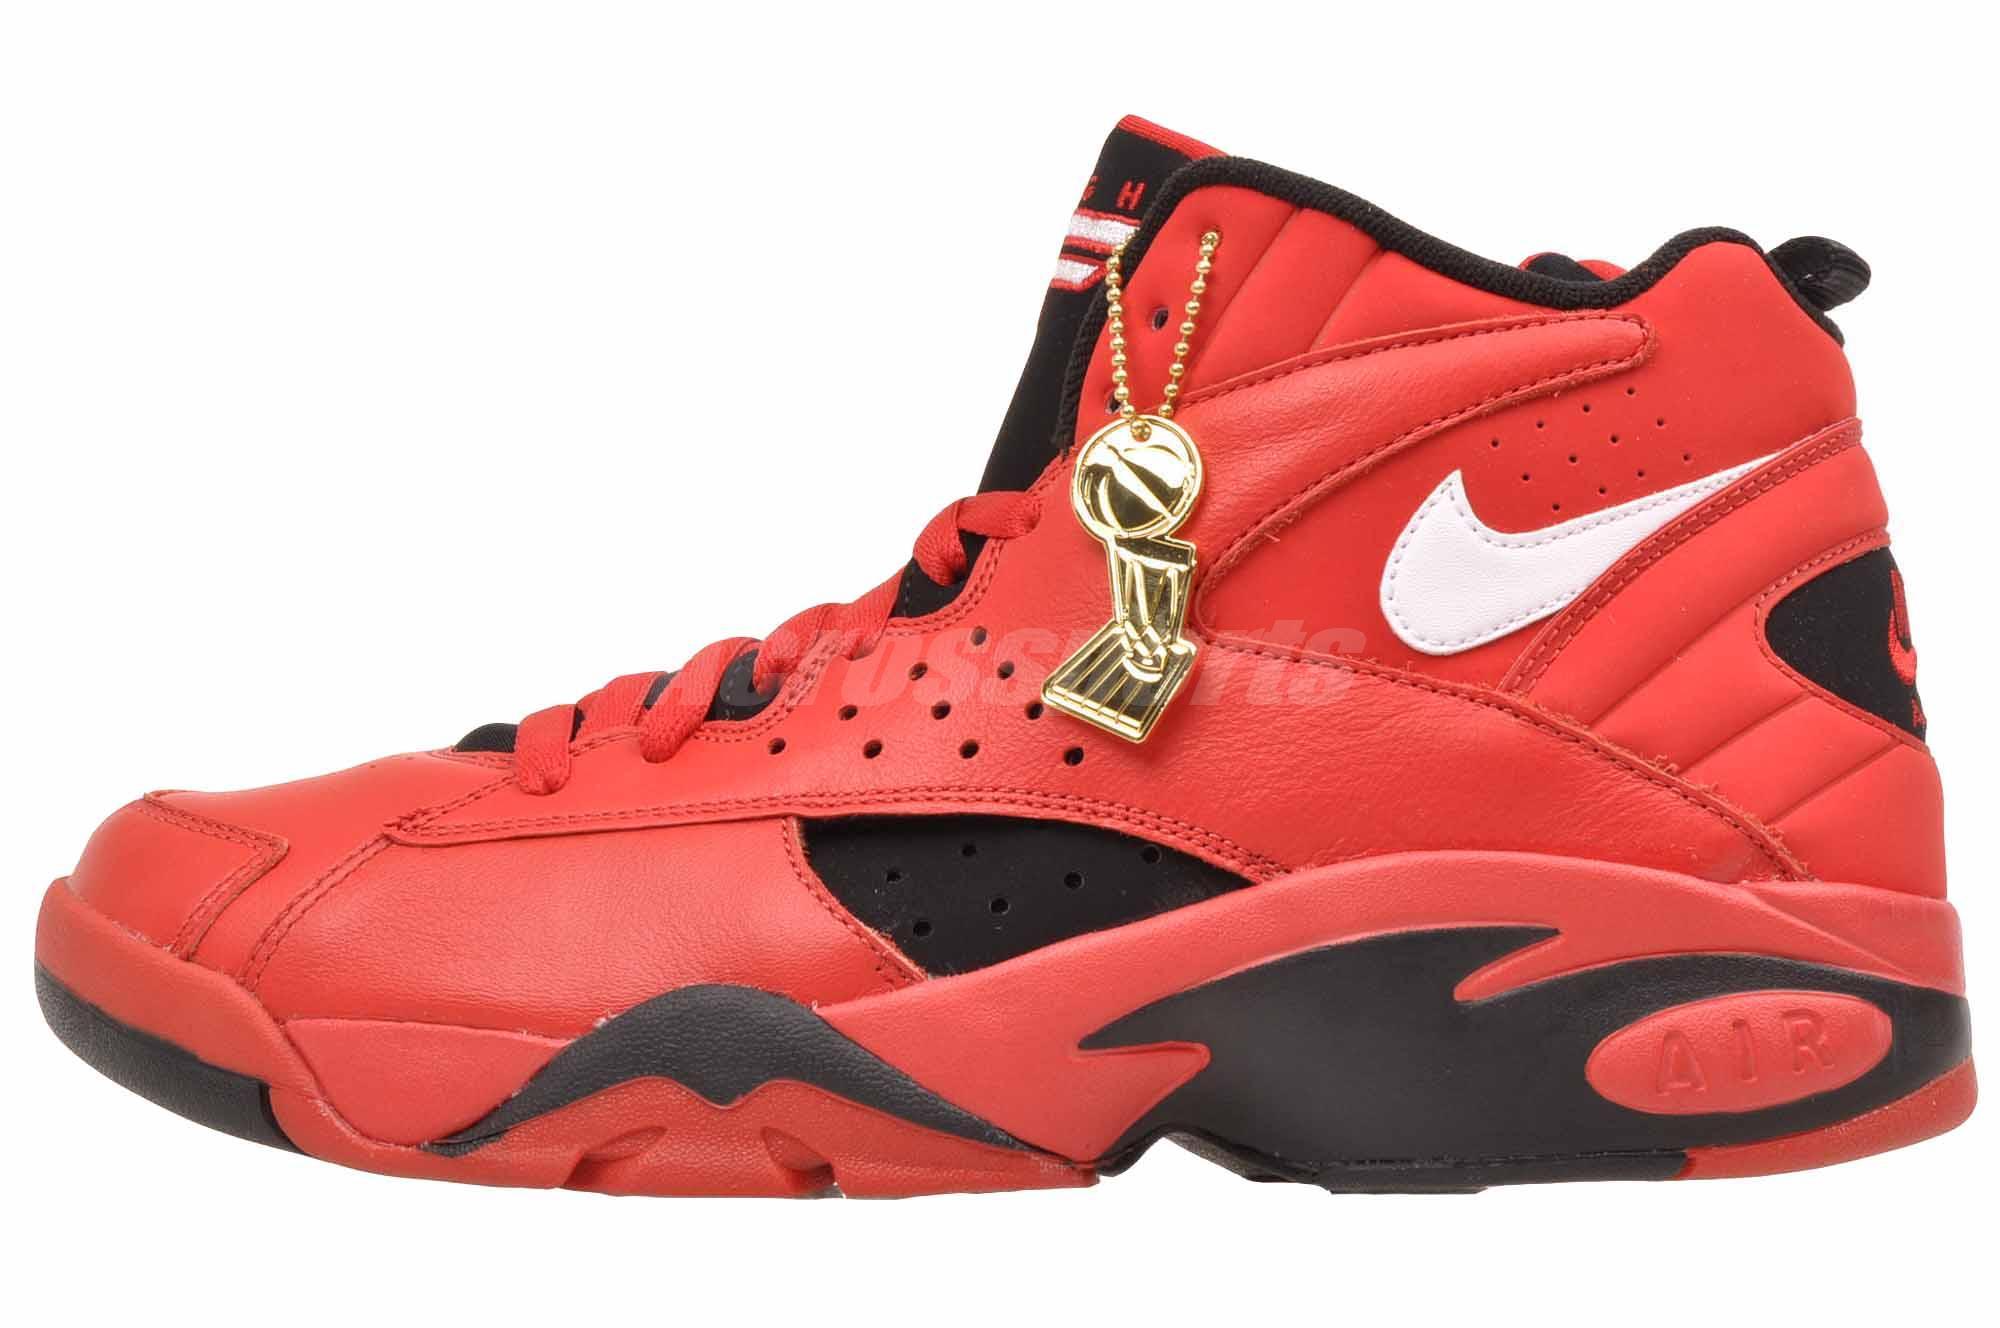 super popular 0579c c2b2b Details about Nike Air Maestro II 2 Trifecta QS Basketball Mens Shoes Red  AJ9281-600